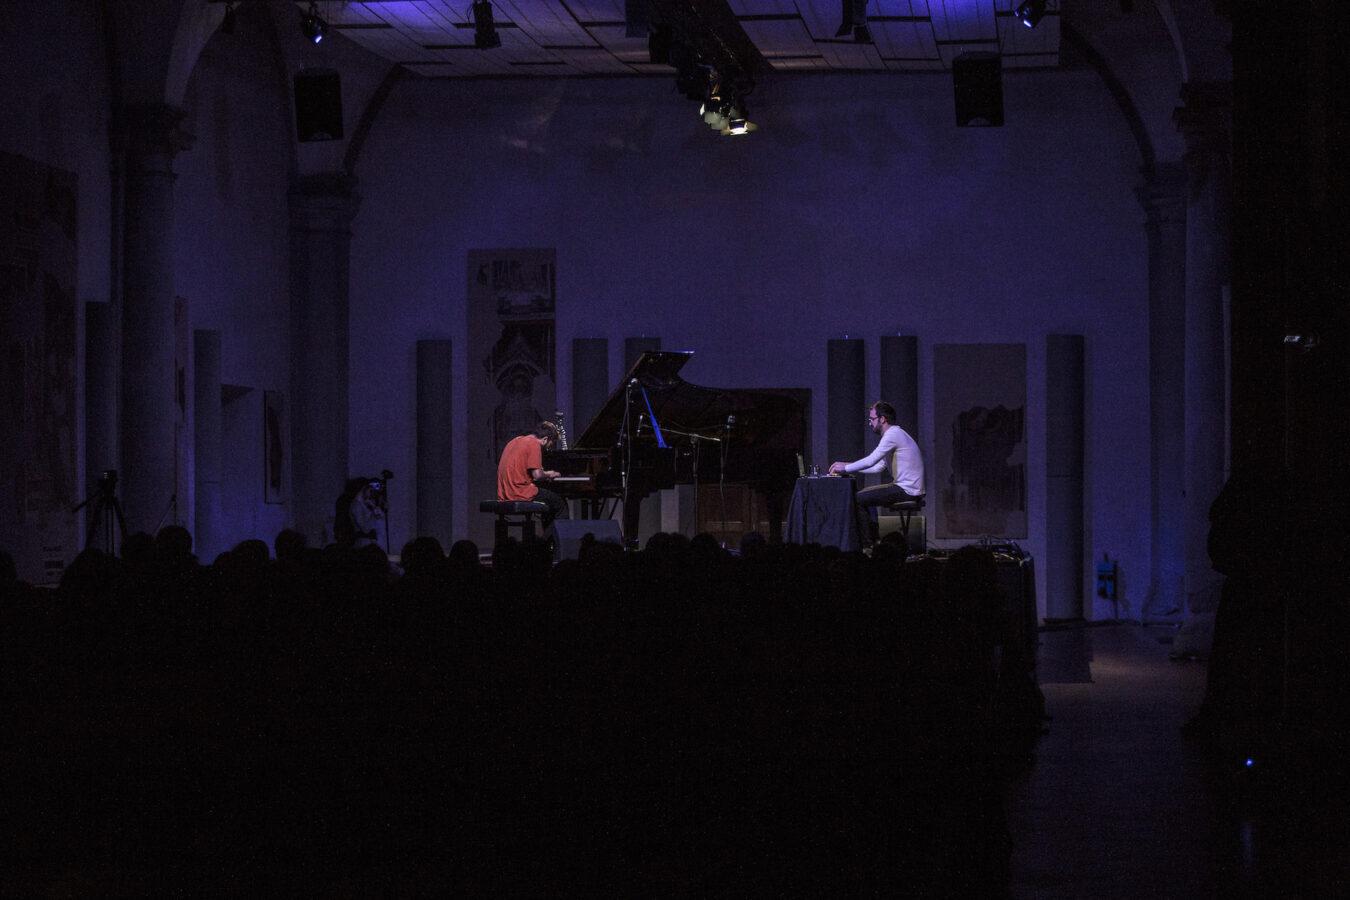 Tommaso Rosati Samuele Strufaldi